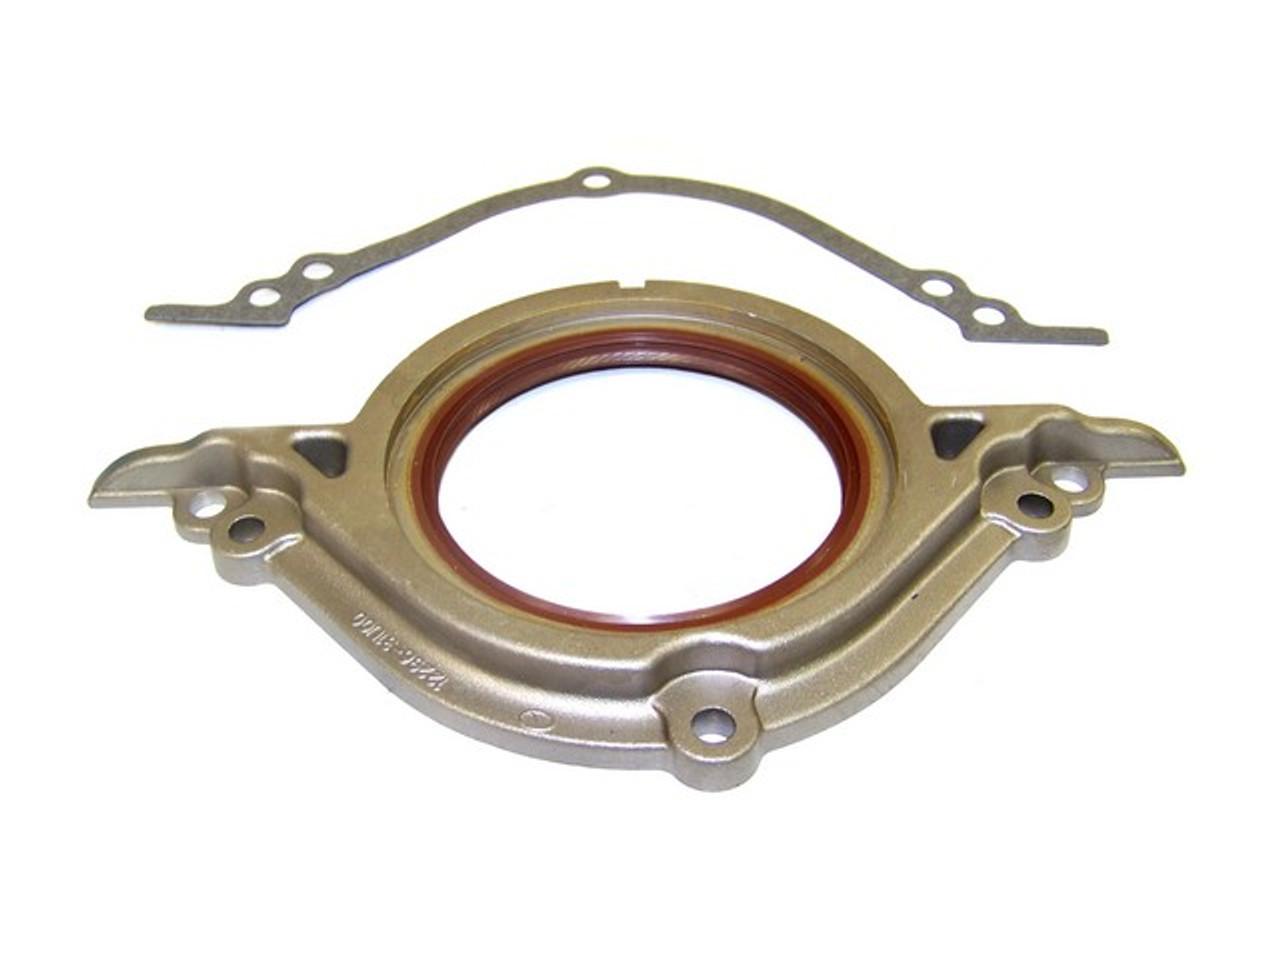 Crankshaft Seal 3.5L 2009 Nissan Pathfinder - RM632.86